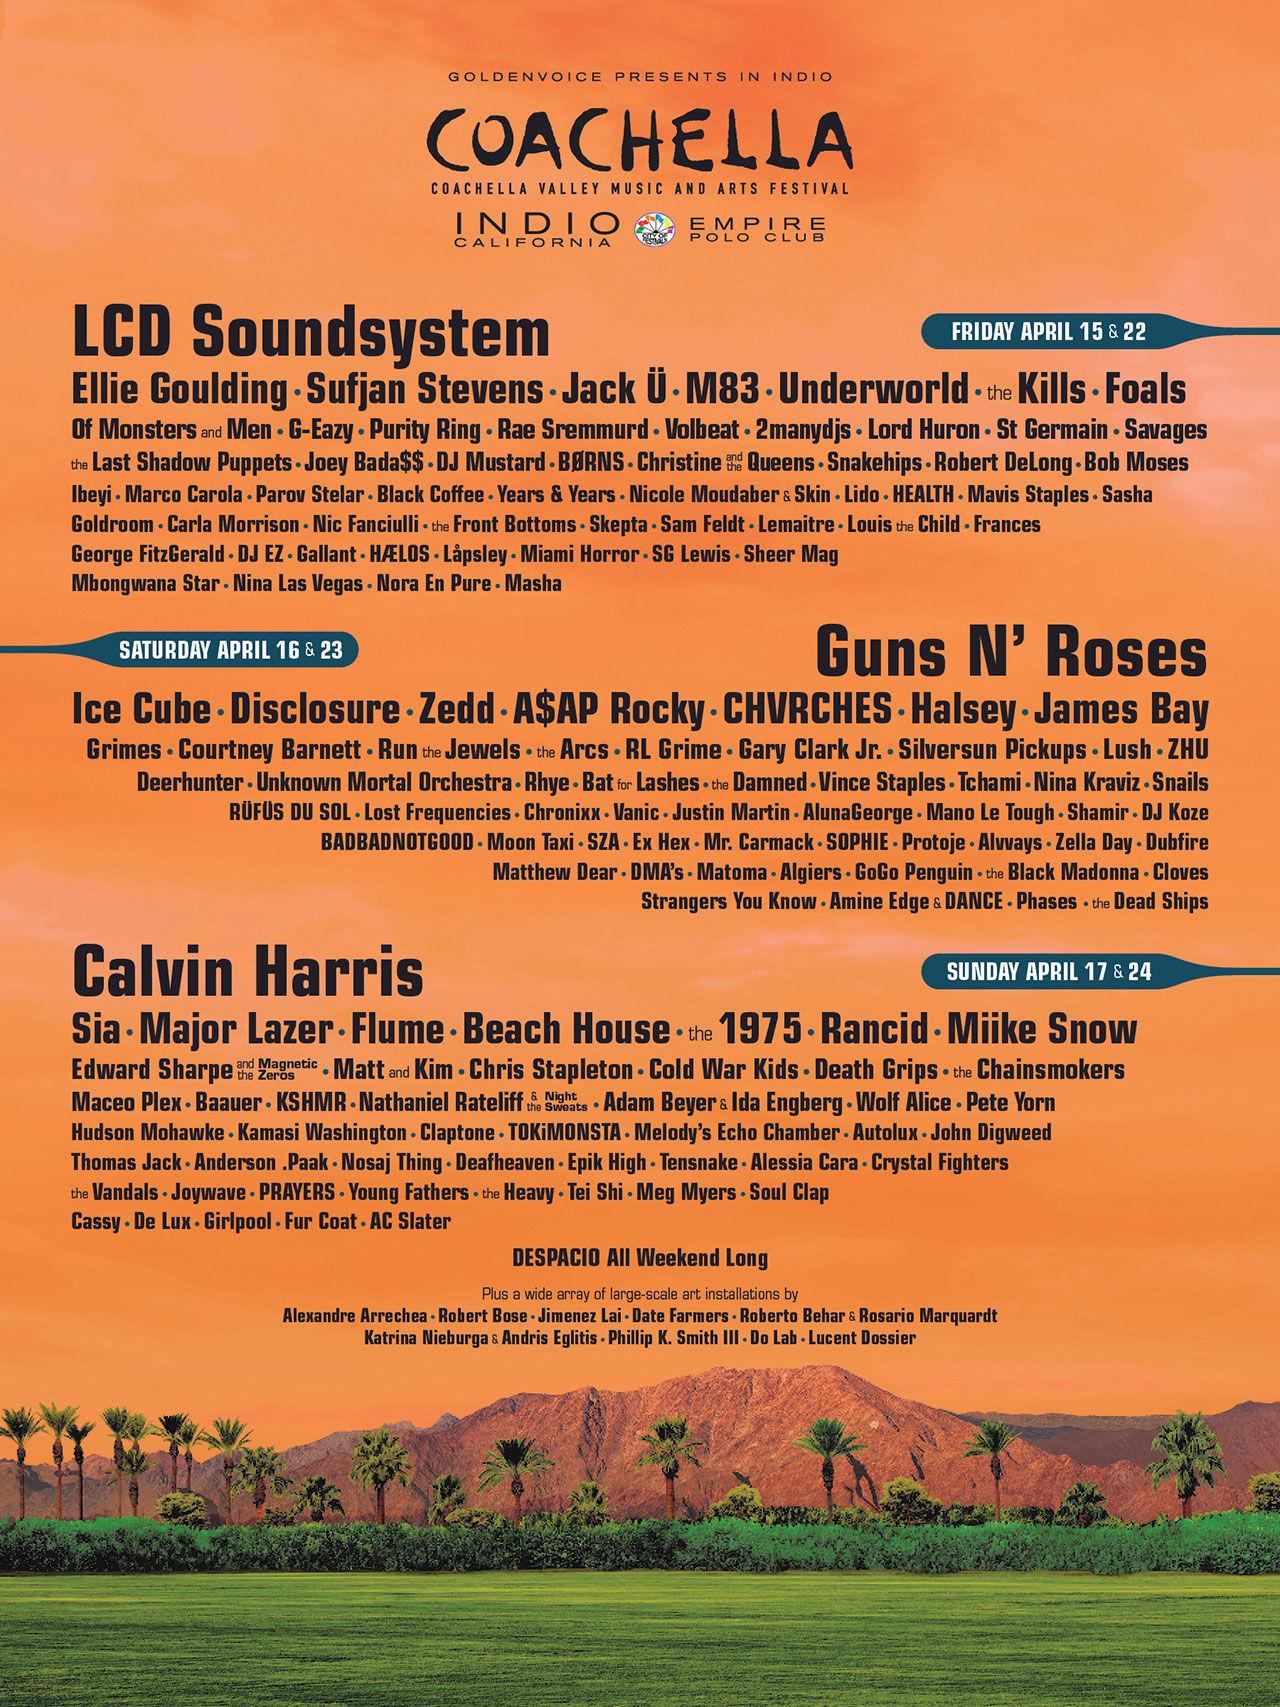 Coachella presenterar årets artister